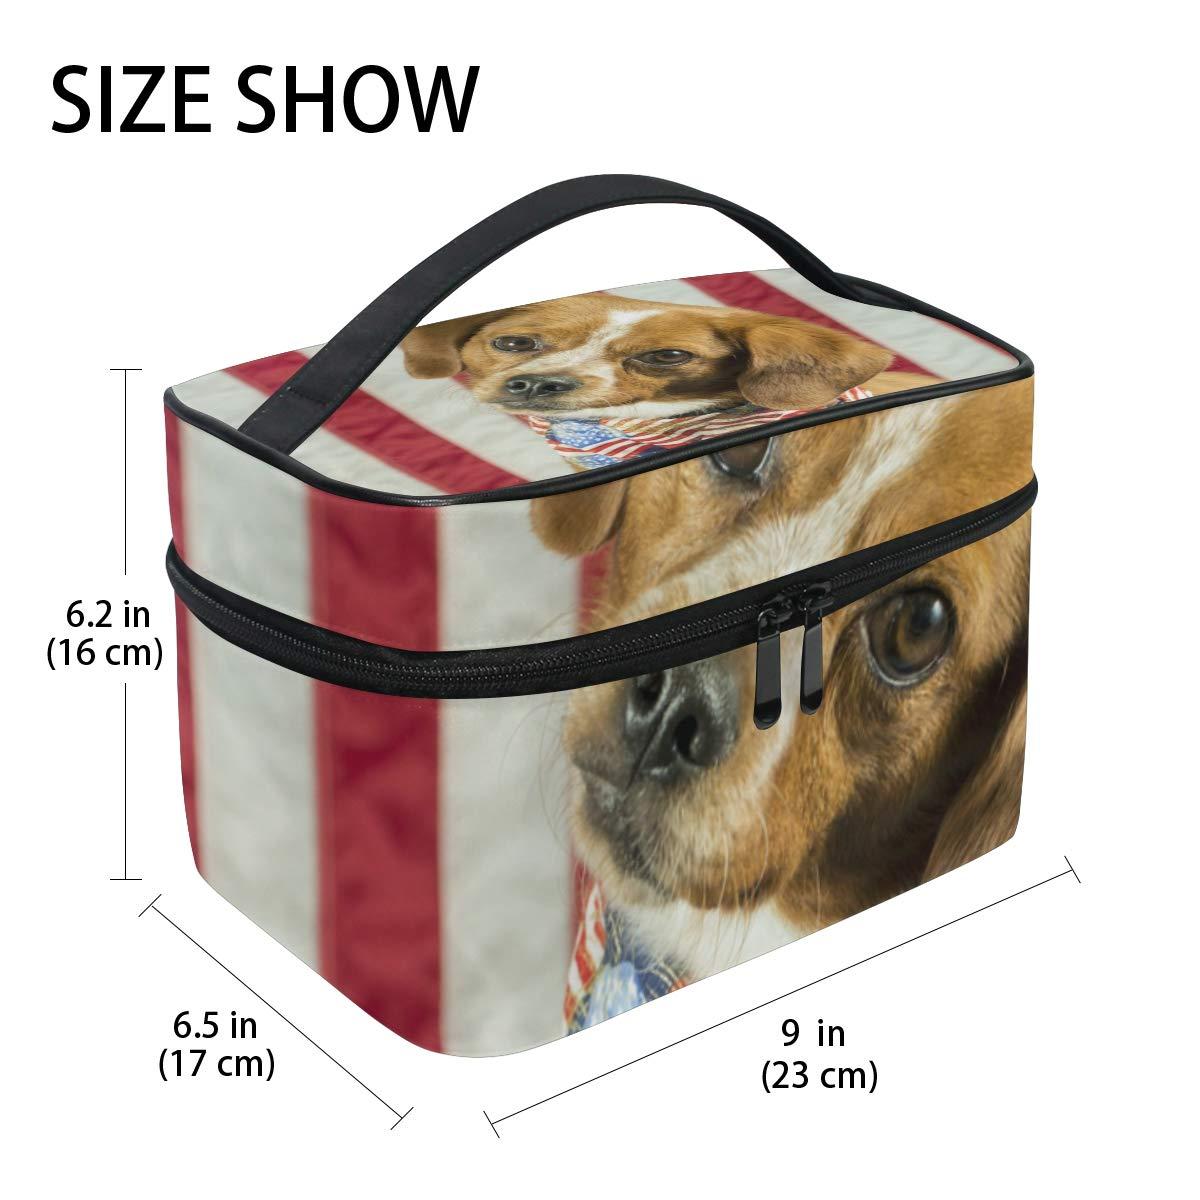 7a8328b07610 Amazon.com : Makeup Bag Square Cosmetic American Cute Beagle Dog ...